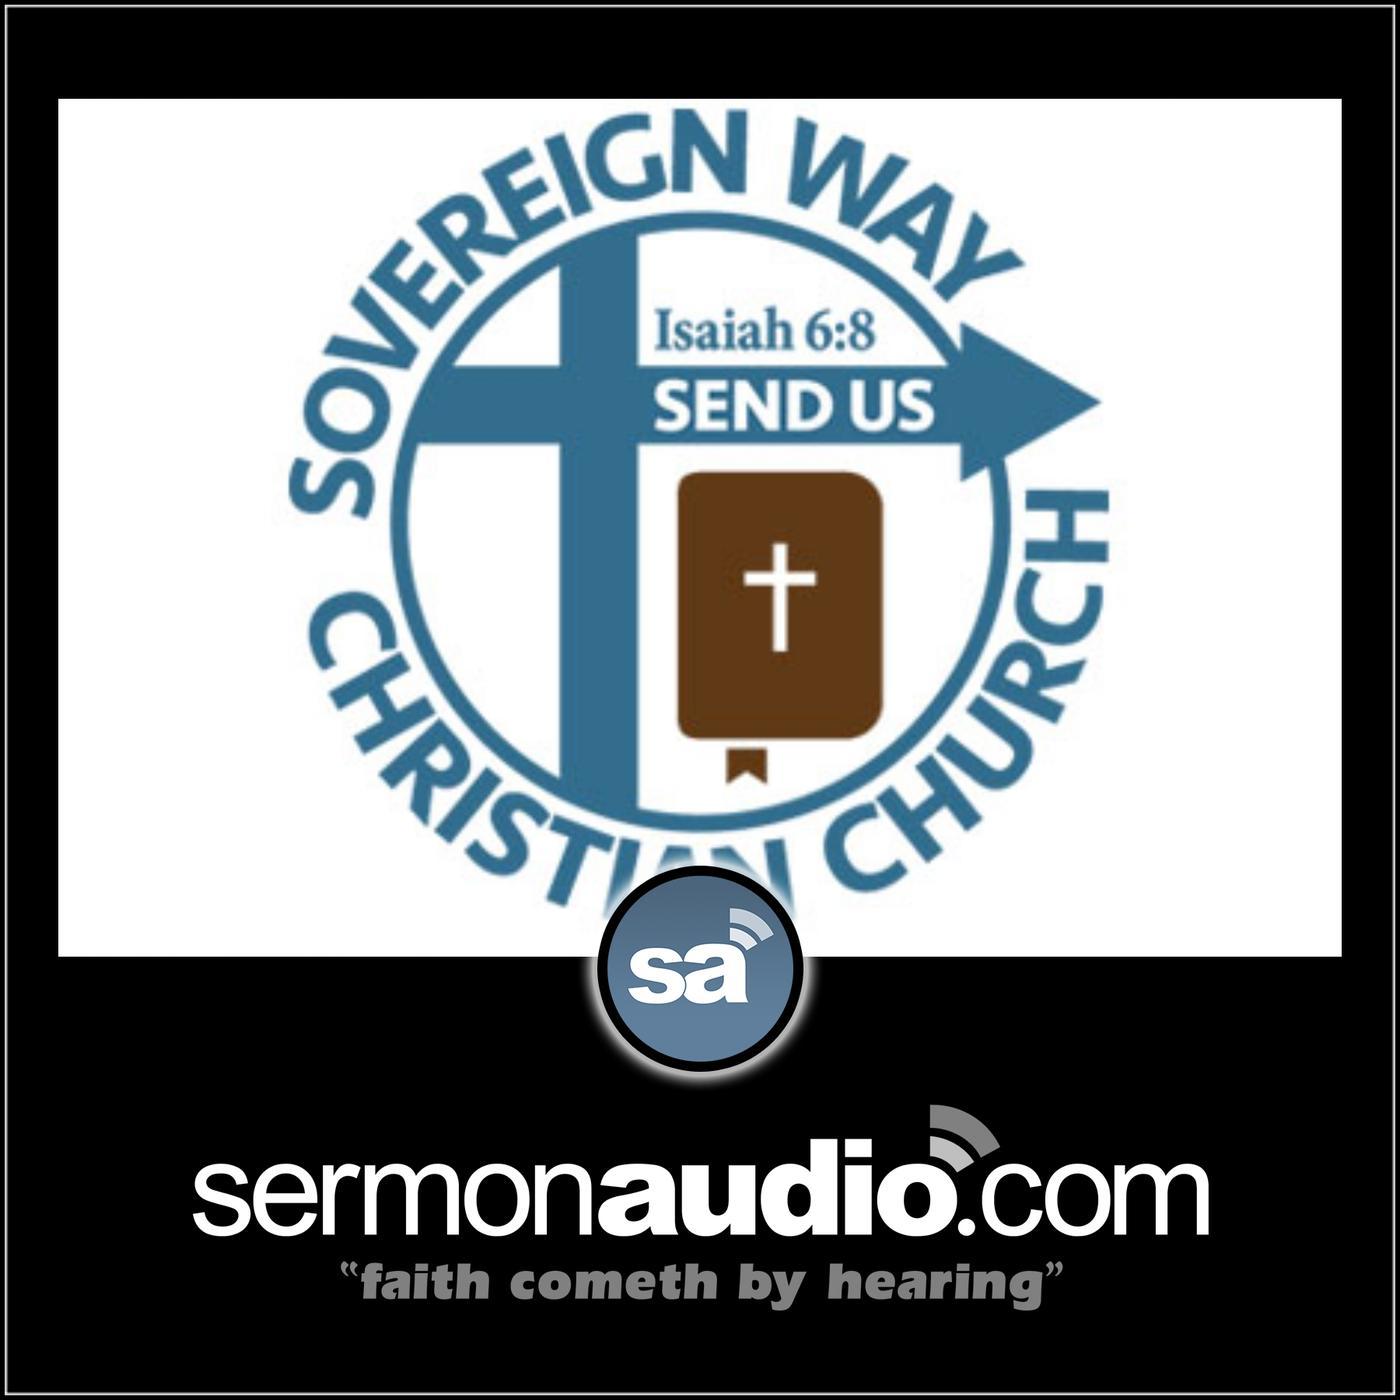 Sovereign Way Christian Church